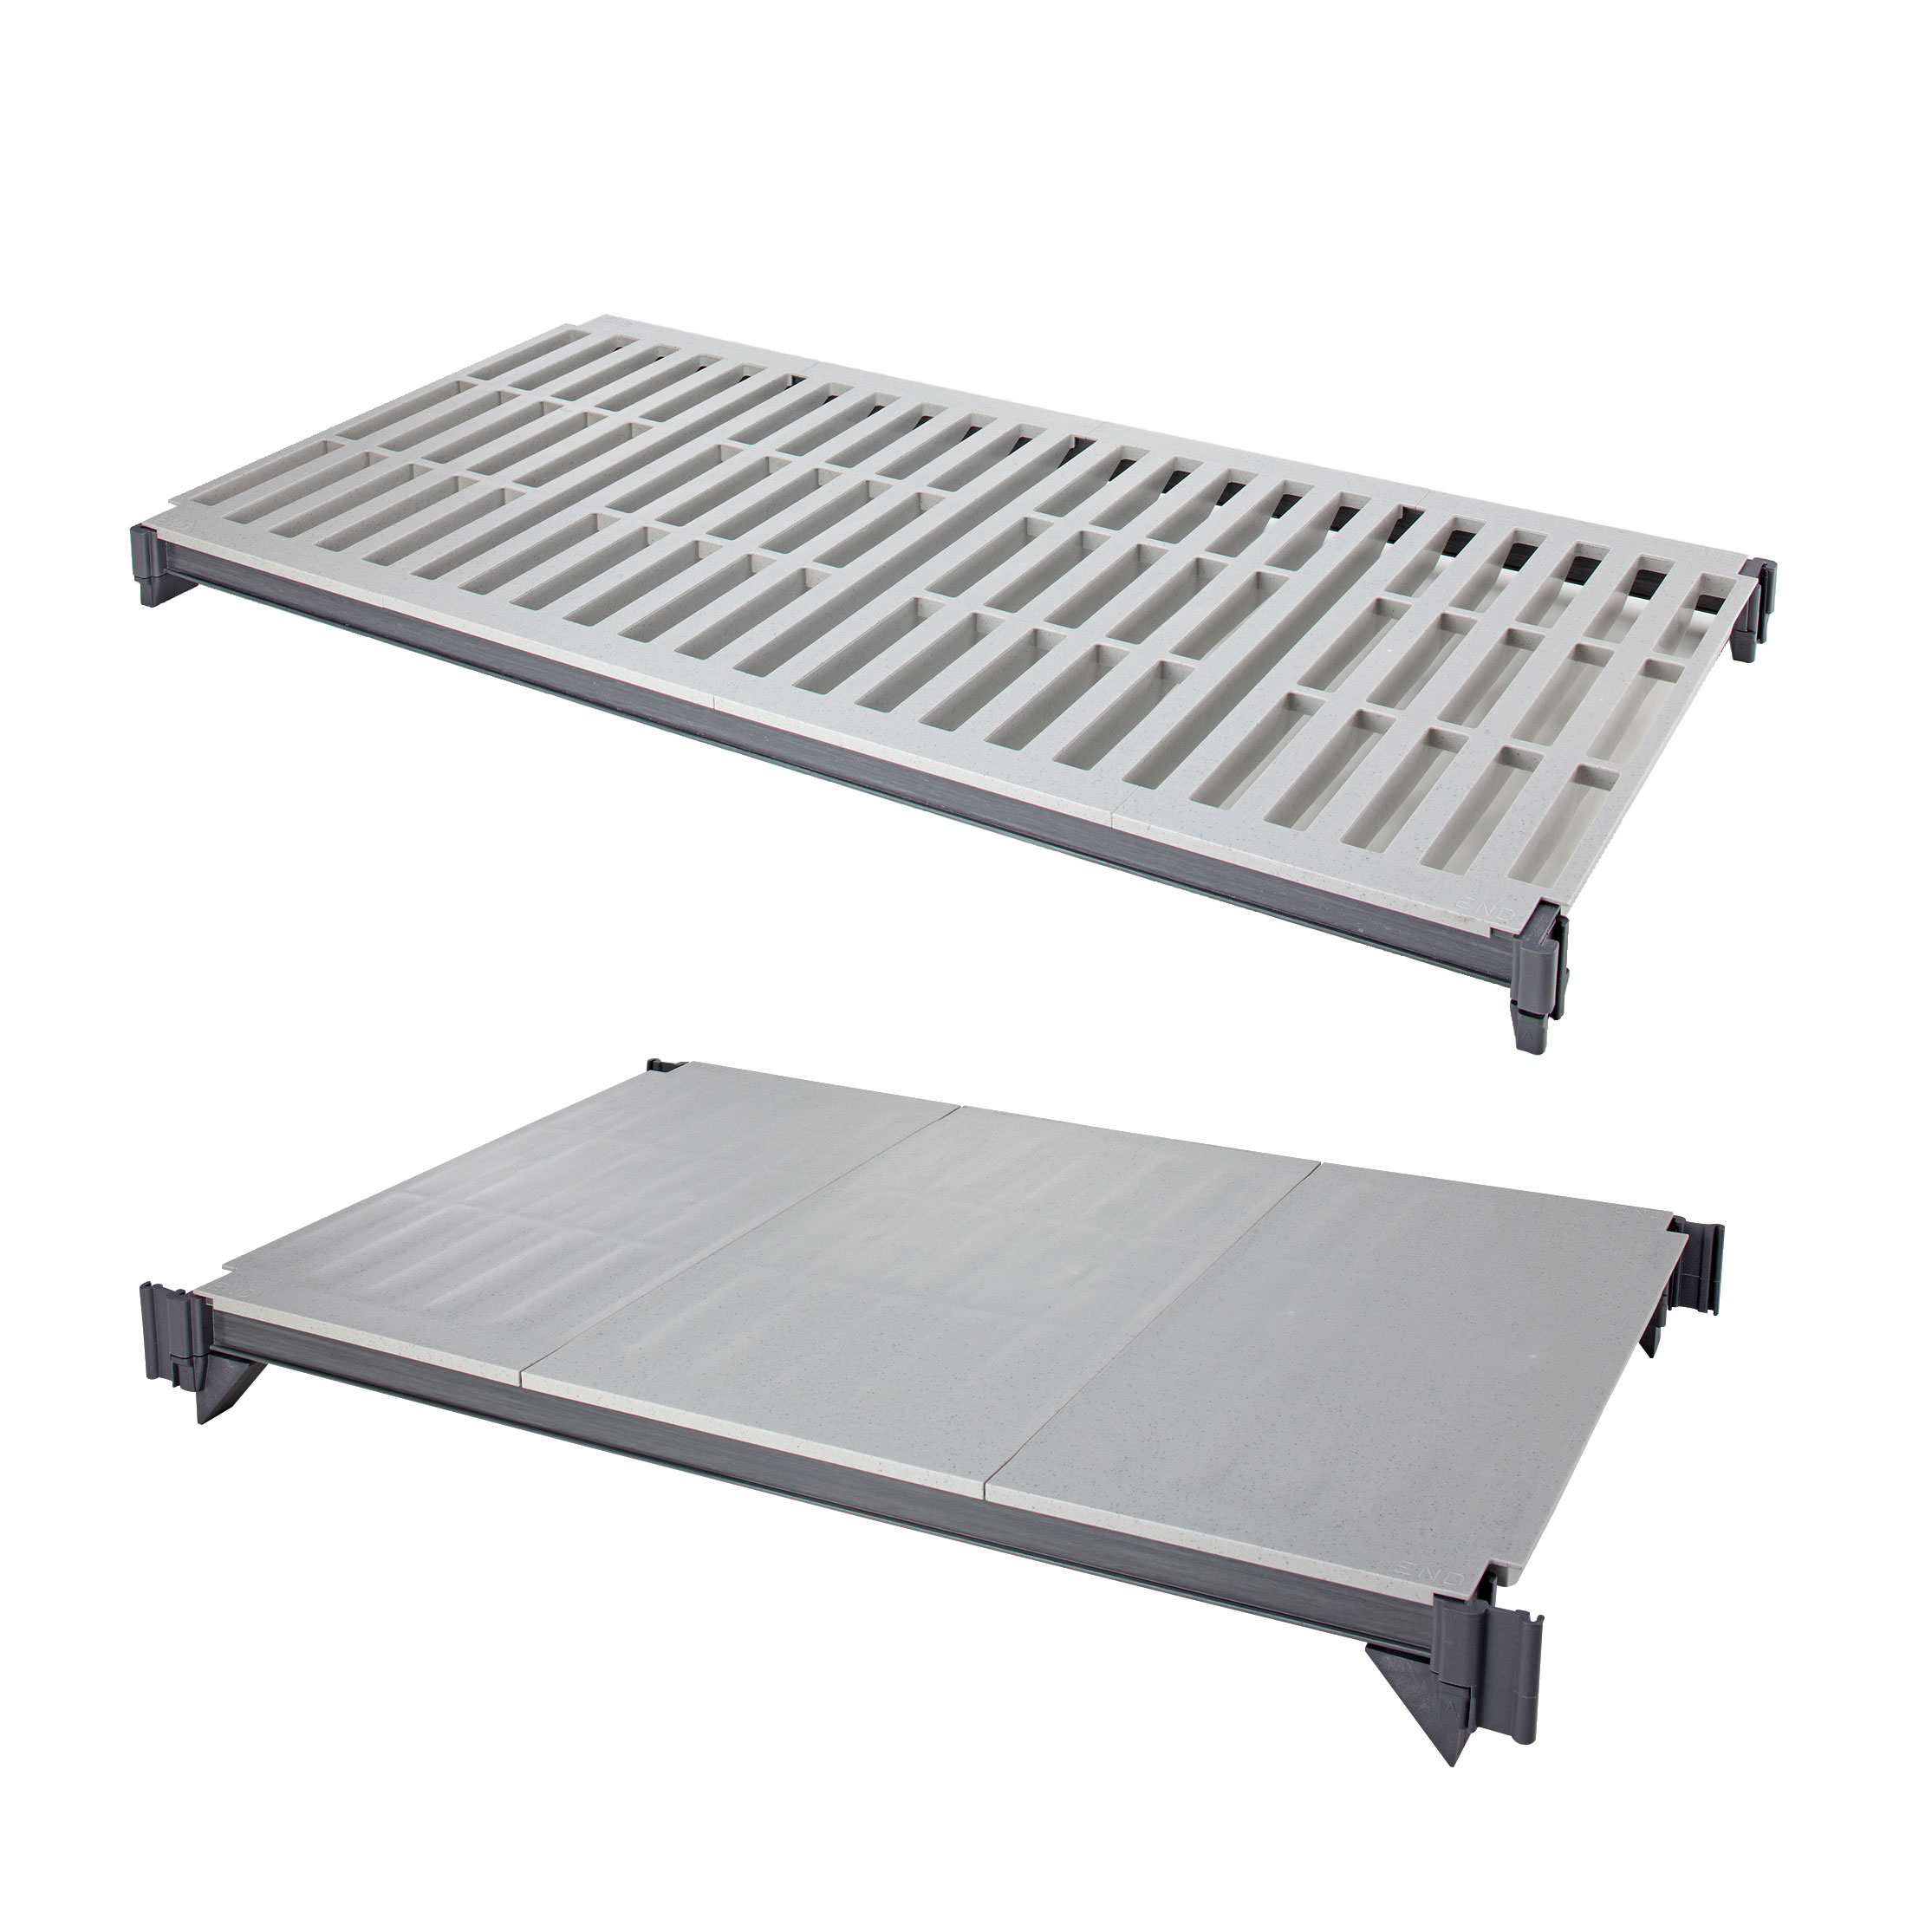 Cambro CBSK2142VS5580 shelving/shelving systems